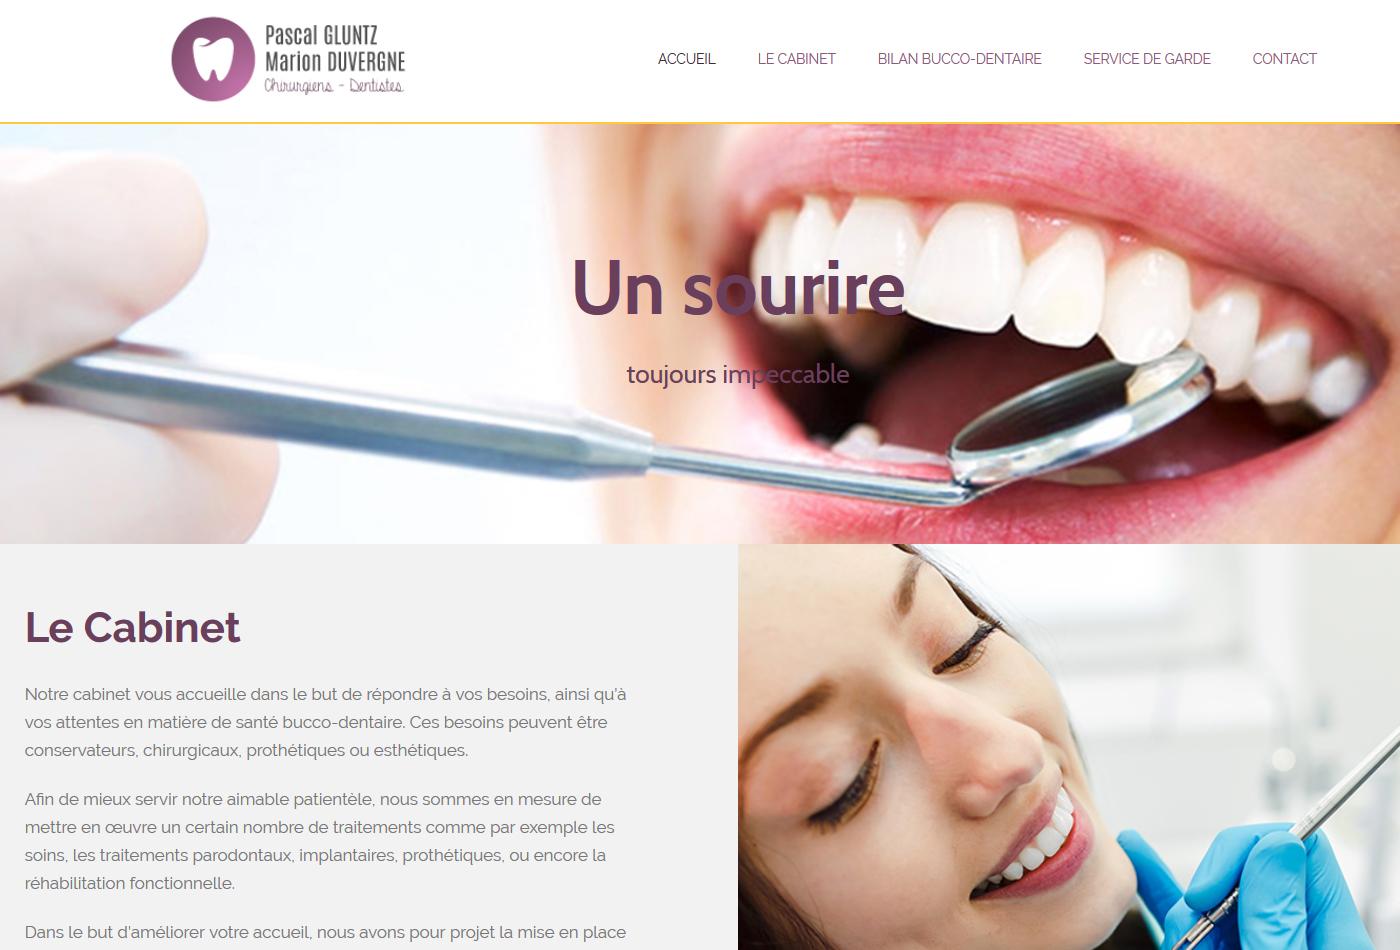 chirurgien dentiste pascal gluntz